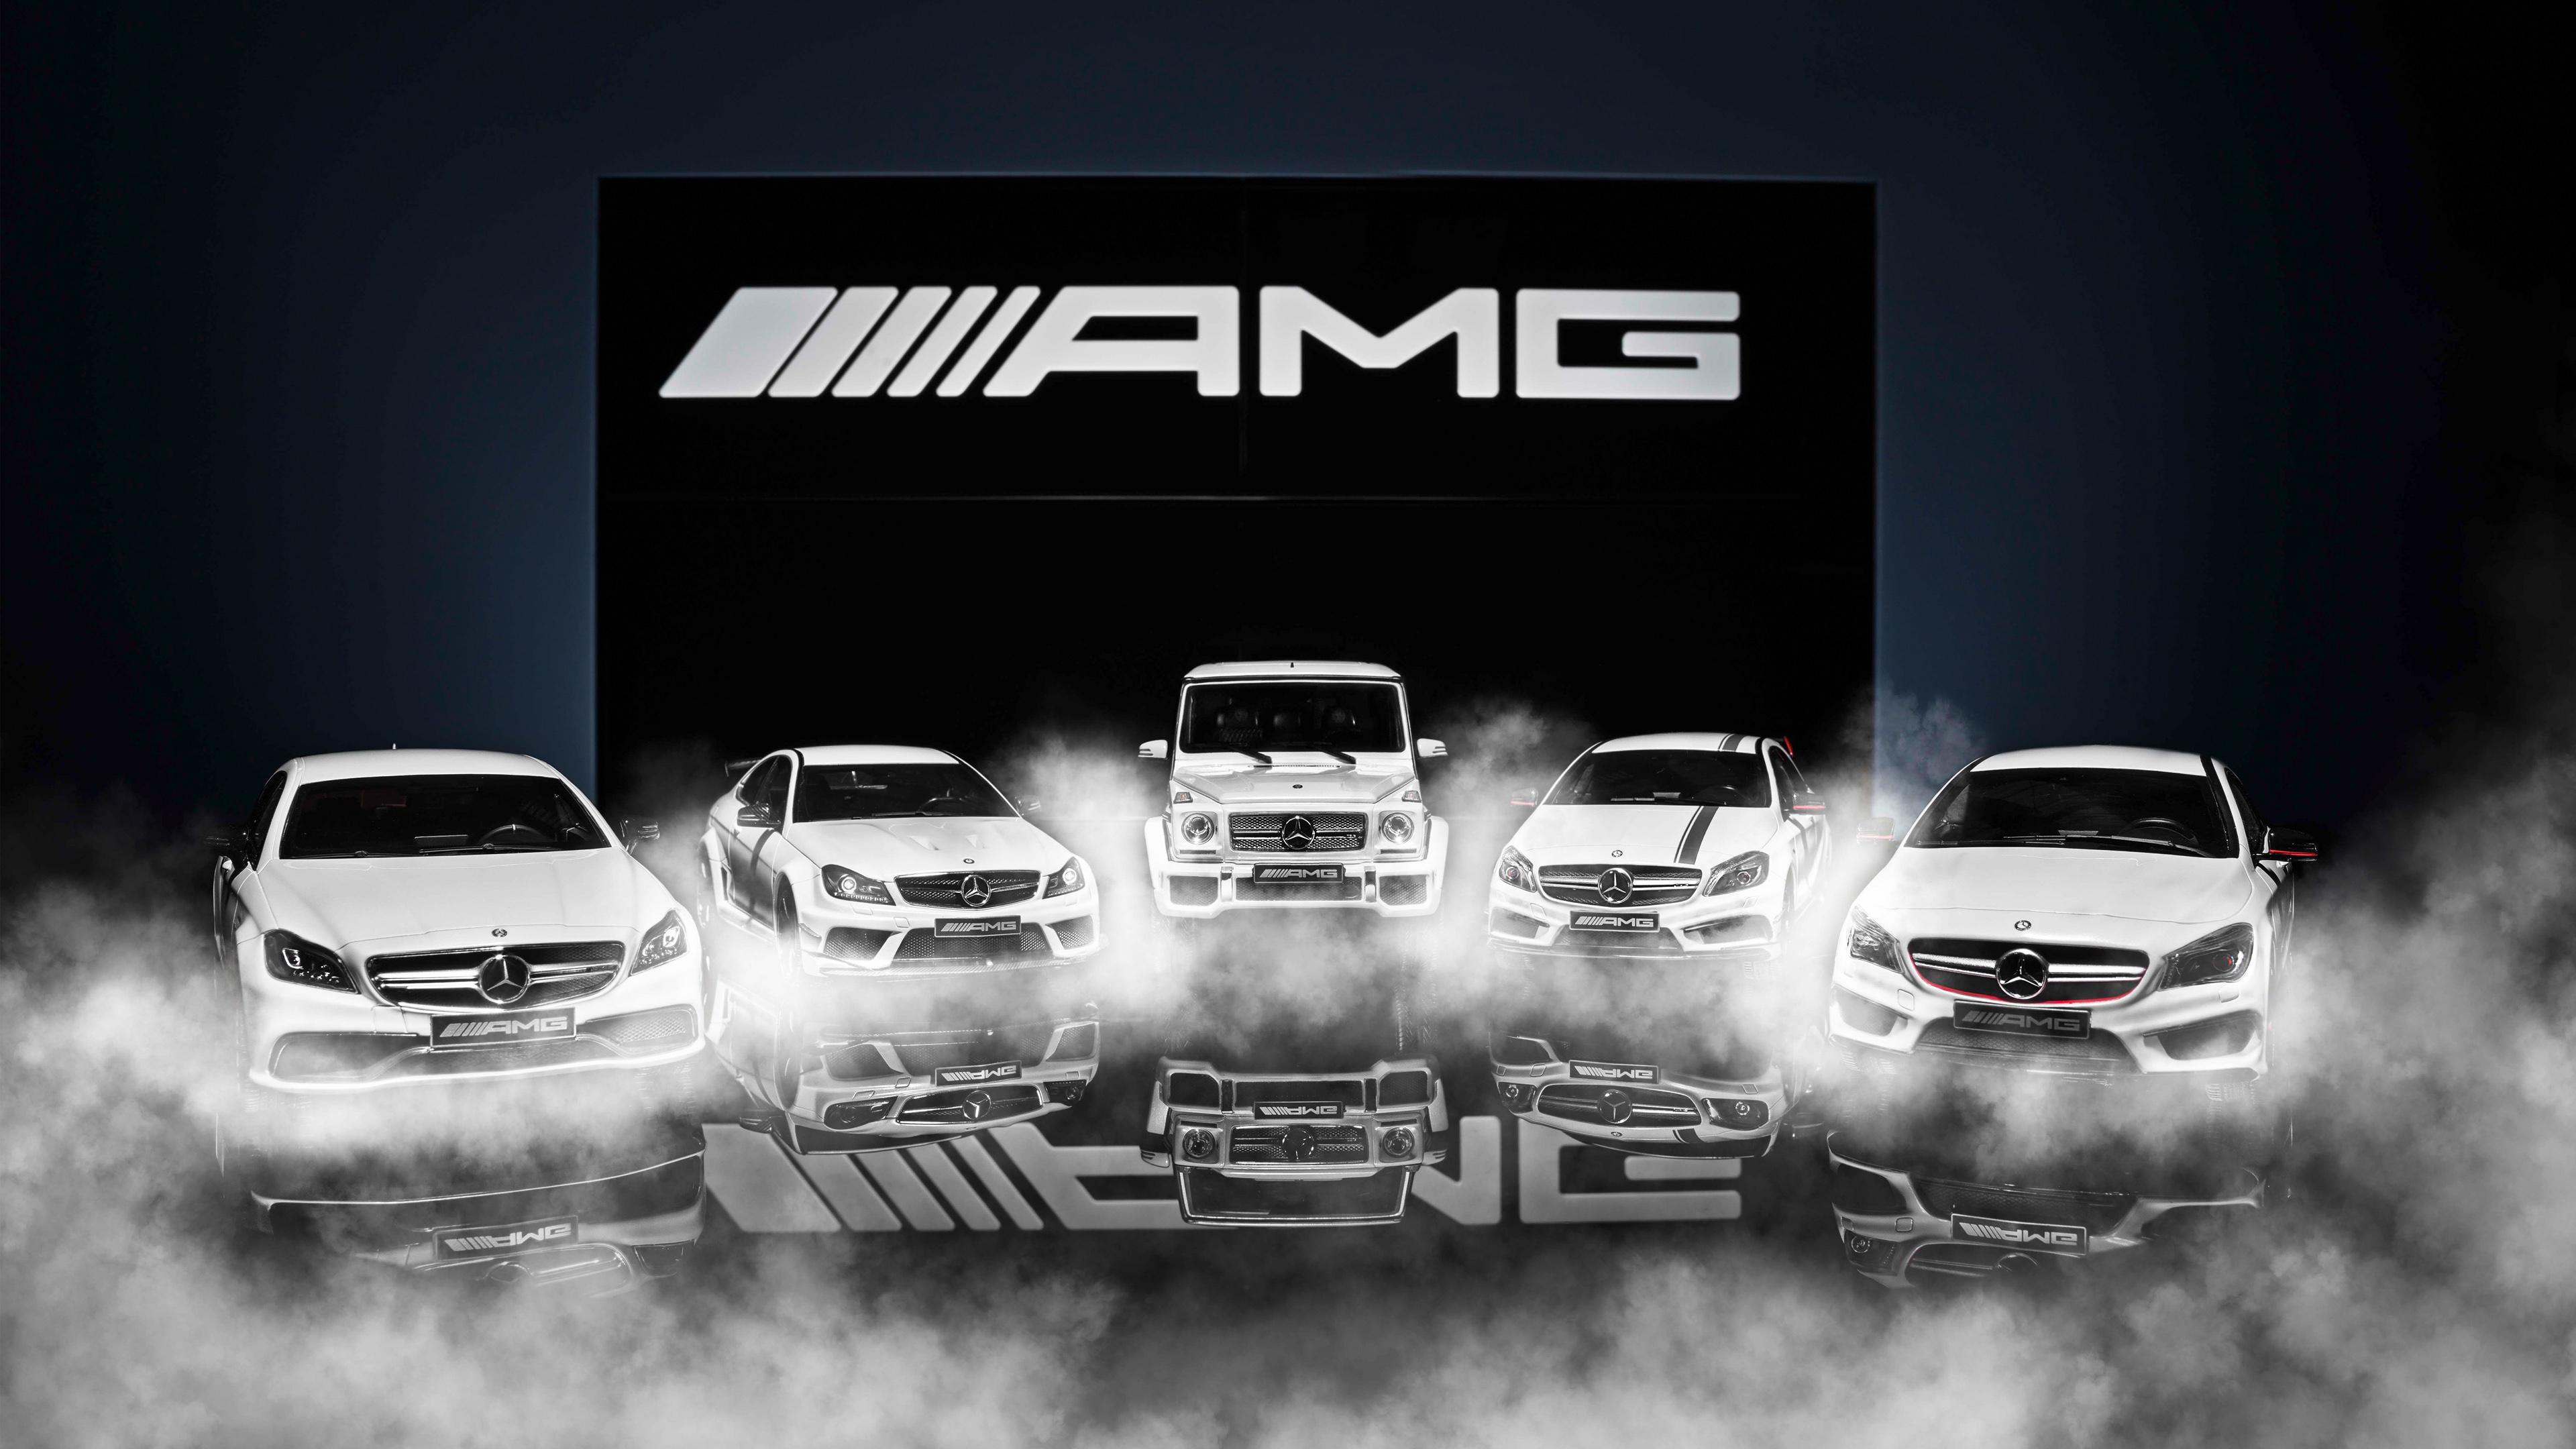 mercedes benz amg group 1535845336 - Mercedes Benz Amg Group - mercedes wallpapers, mercedes benz wallpapers, cars wallpapers